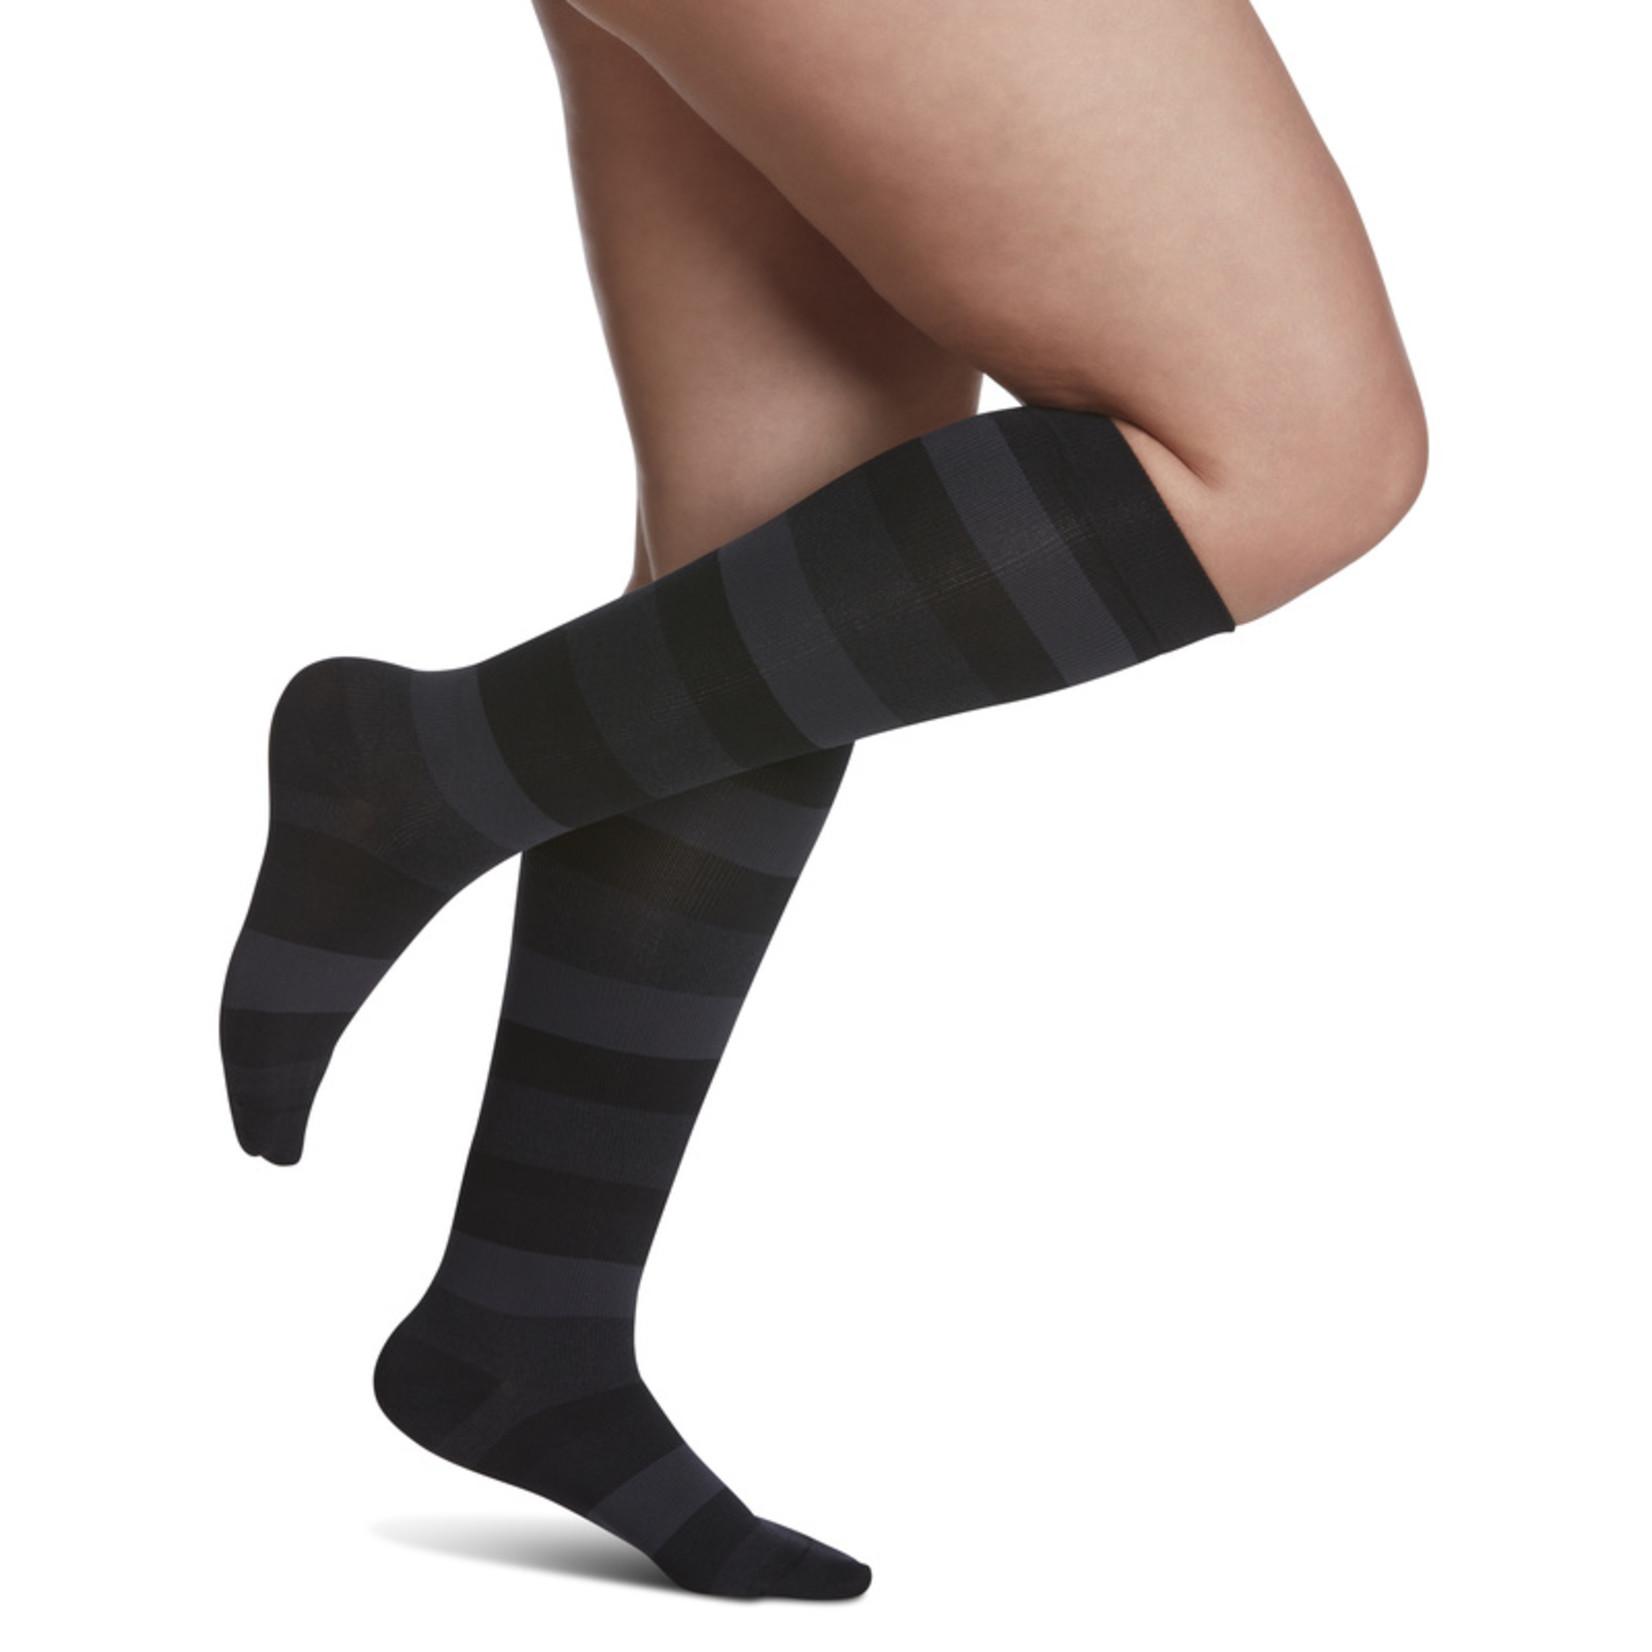 SIGVARIS Women's Style Microfiber Patterns Calf 20-30mmHg